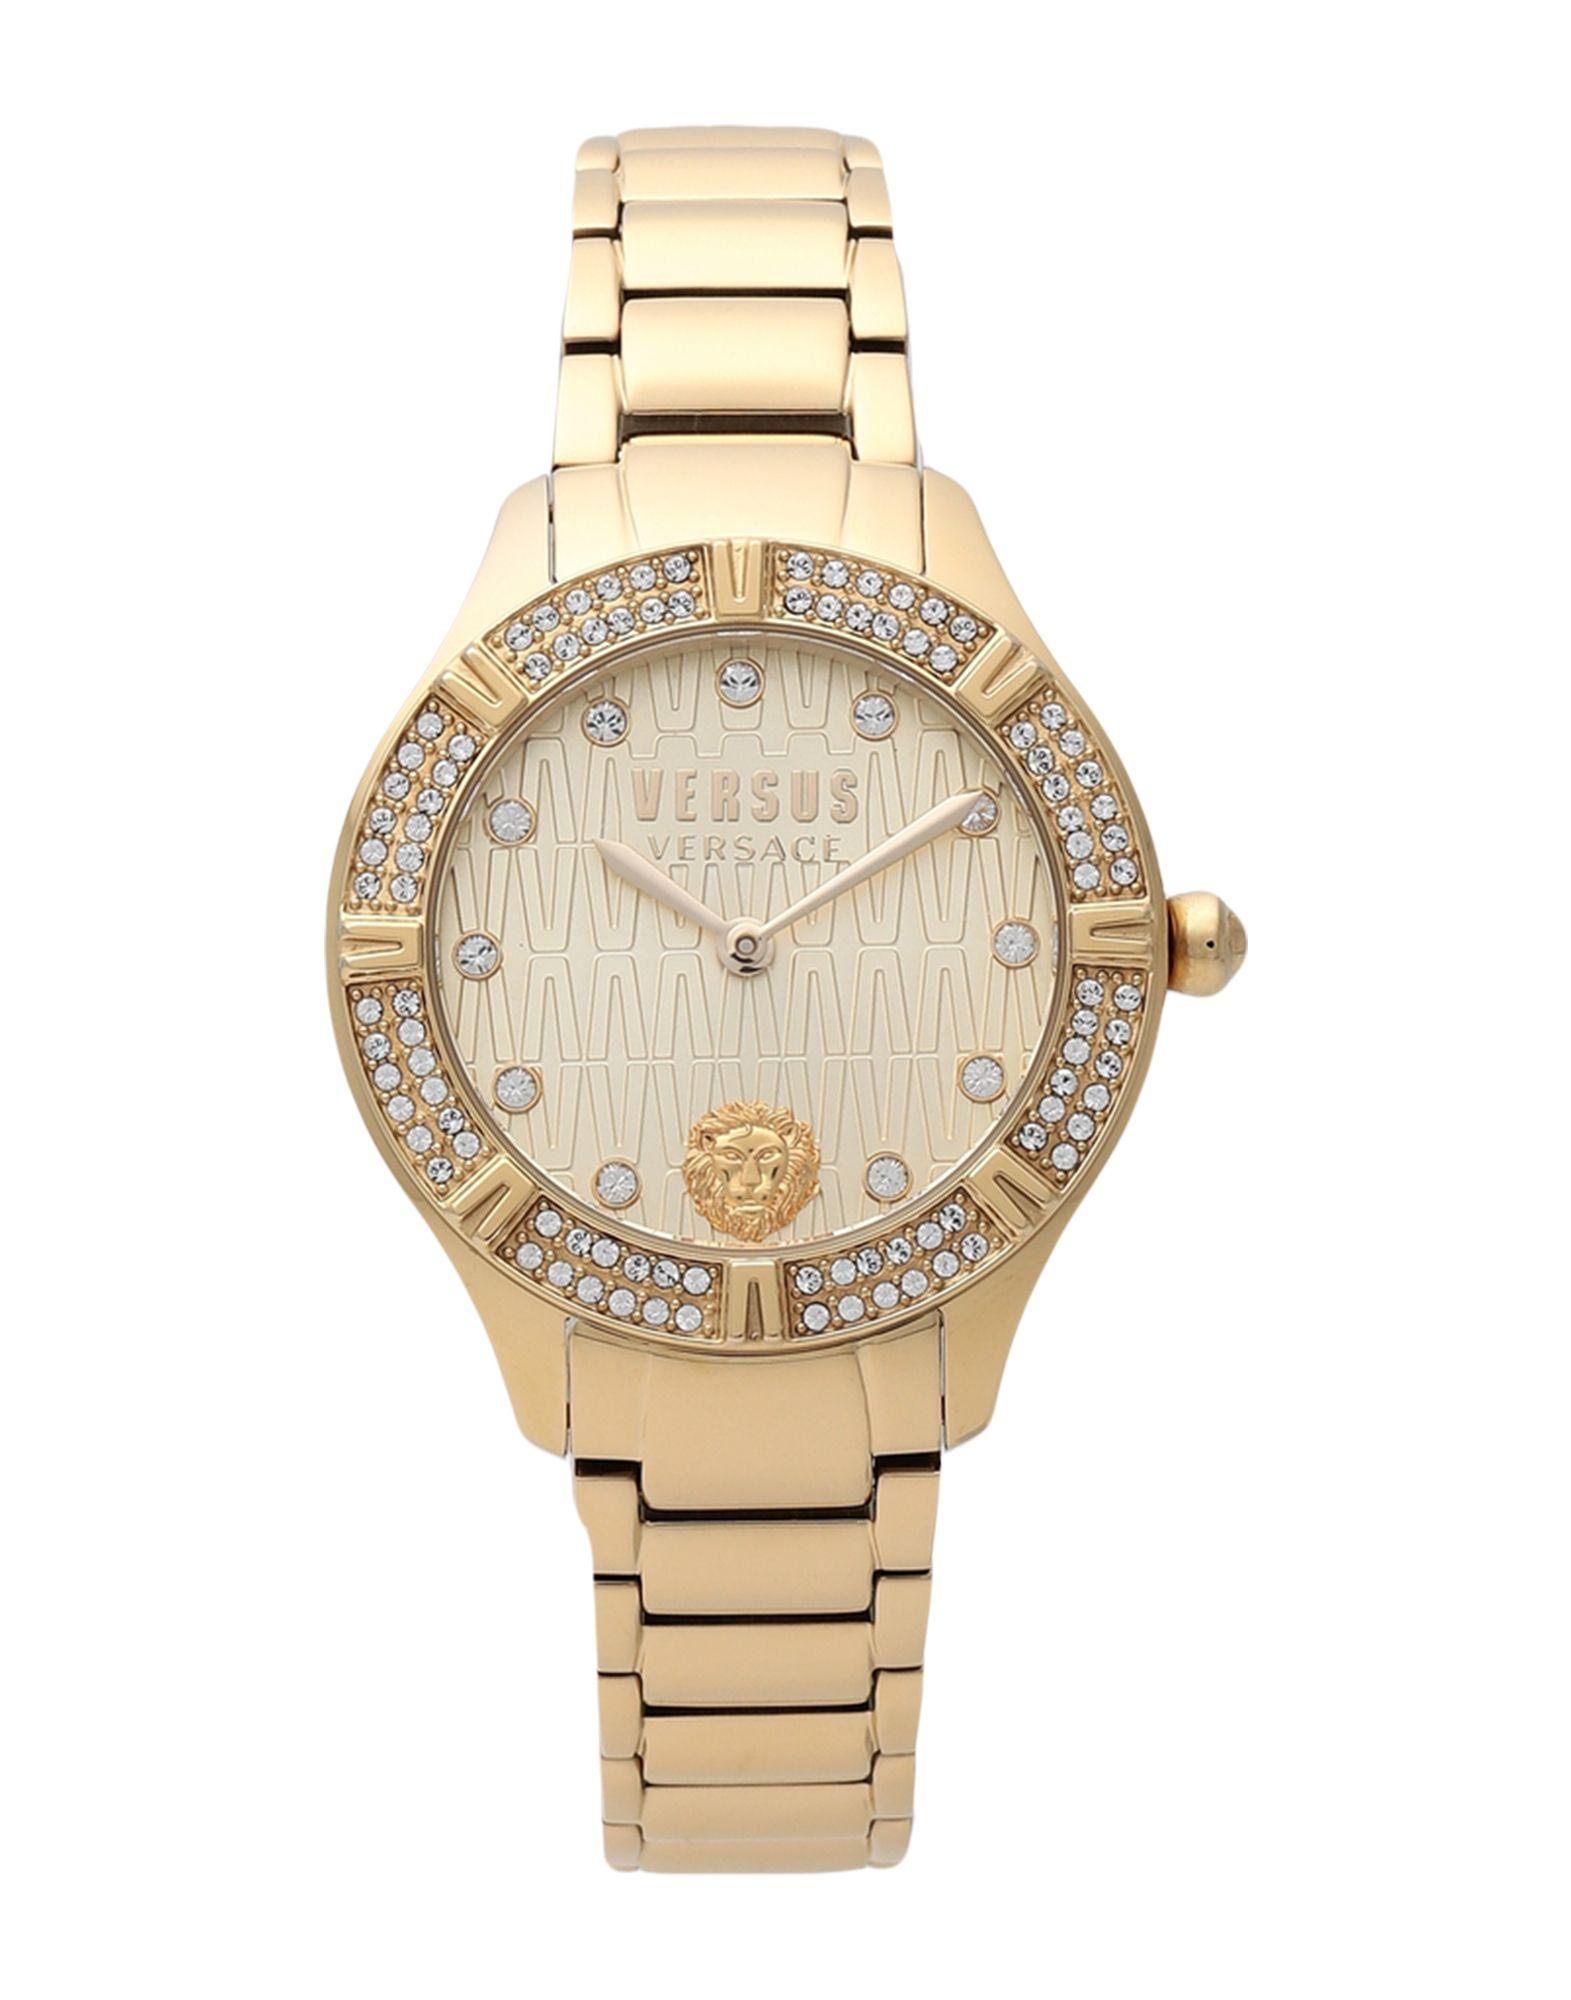 VERSUS VERSACE Wrist watches - Item 58049348